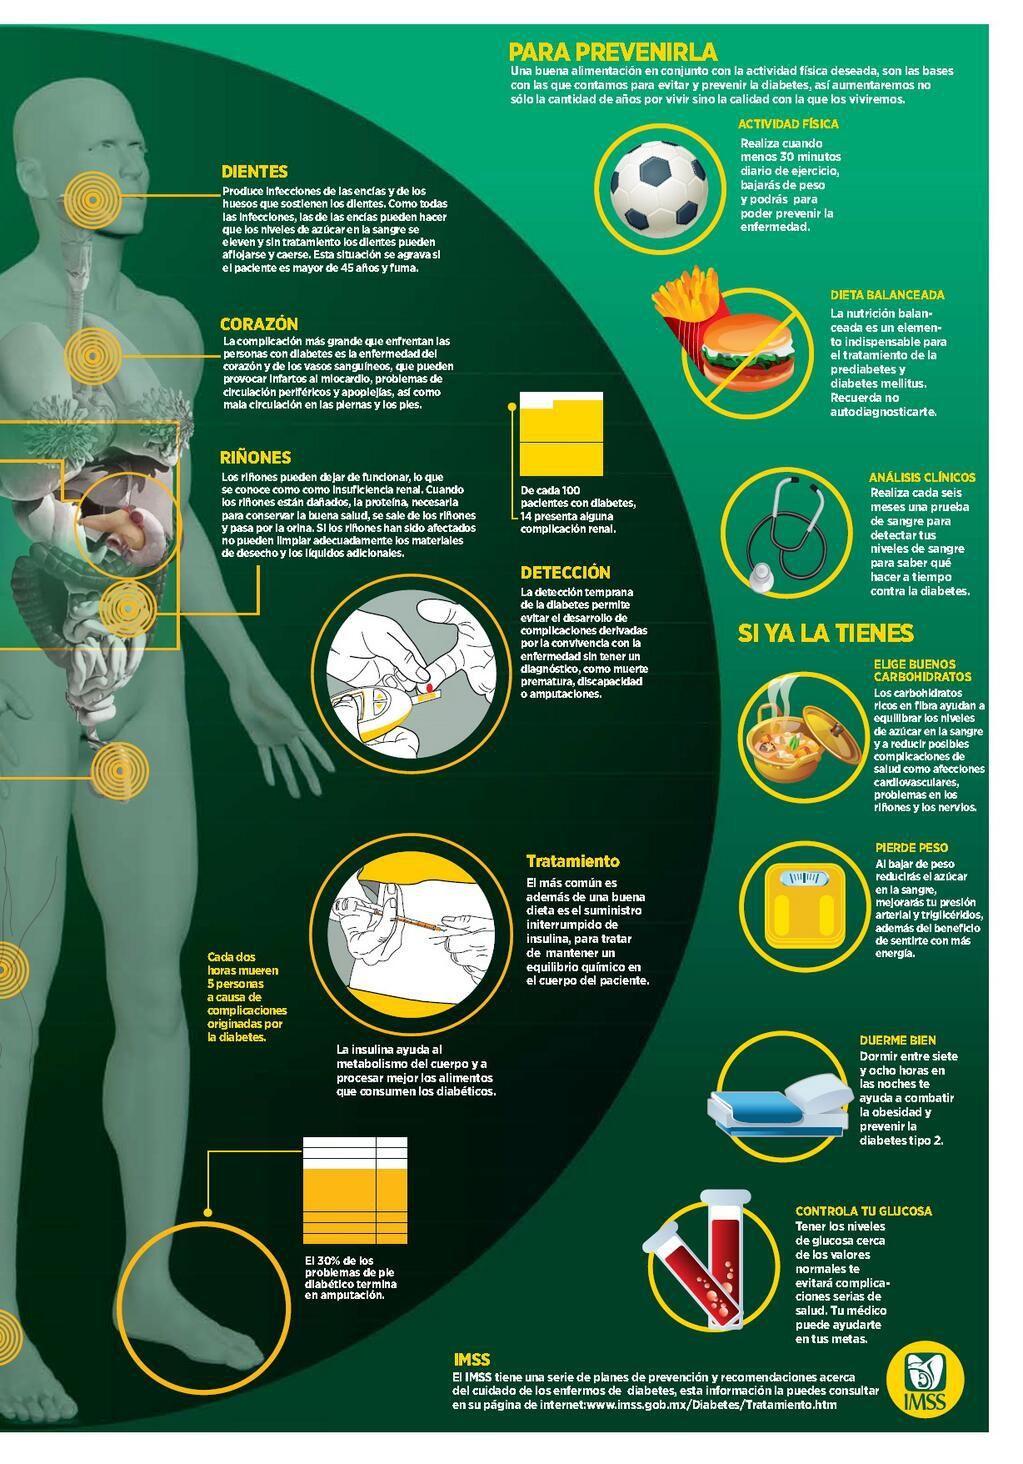 Información de interés sobre la Diabetes #infografia #infographic ...